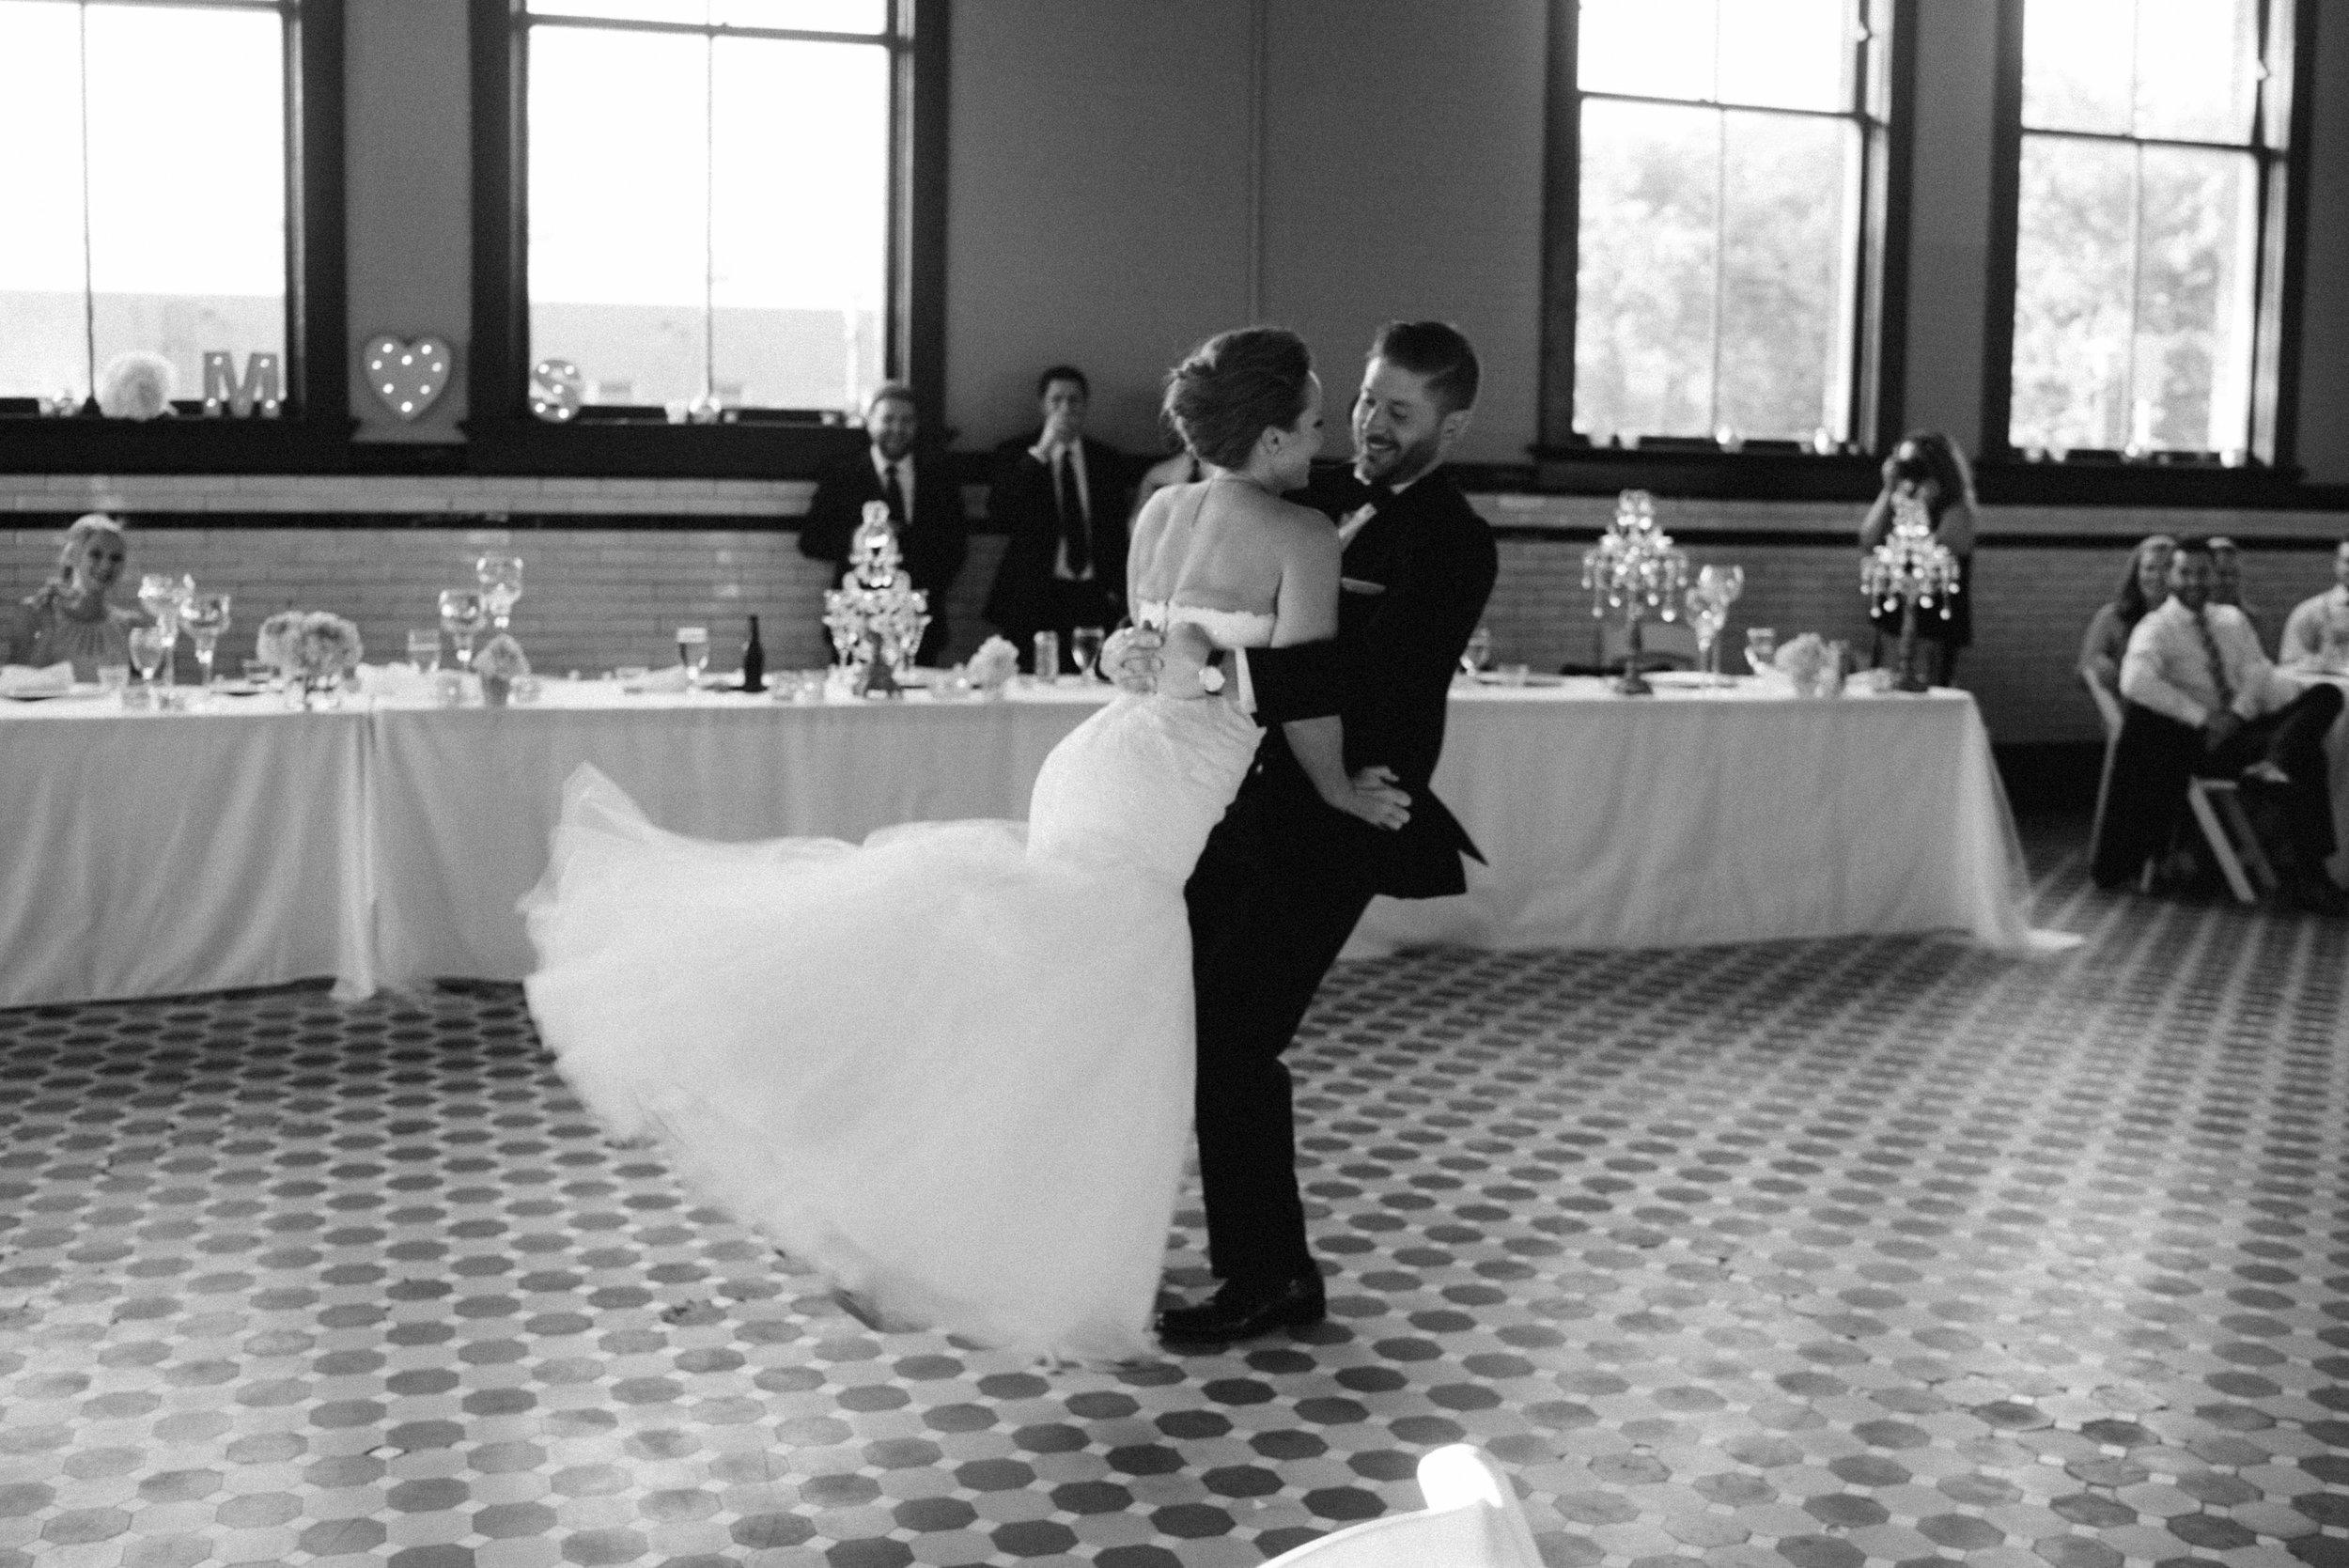 Mina-Steve-Blog-Indianapolis-Wedding-154.jpg